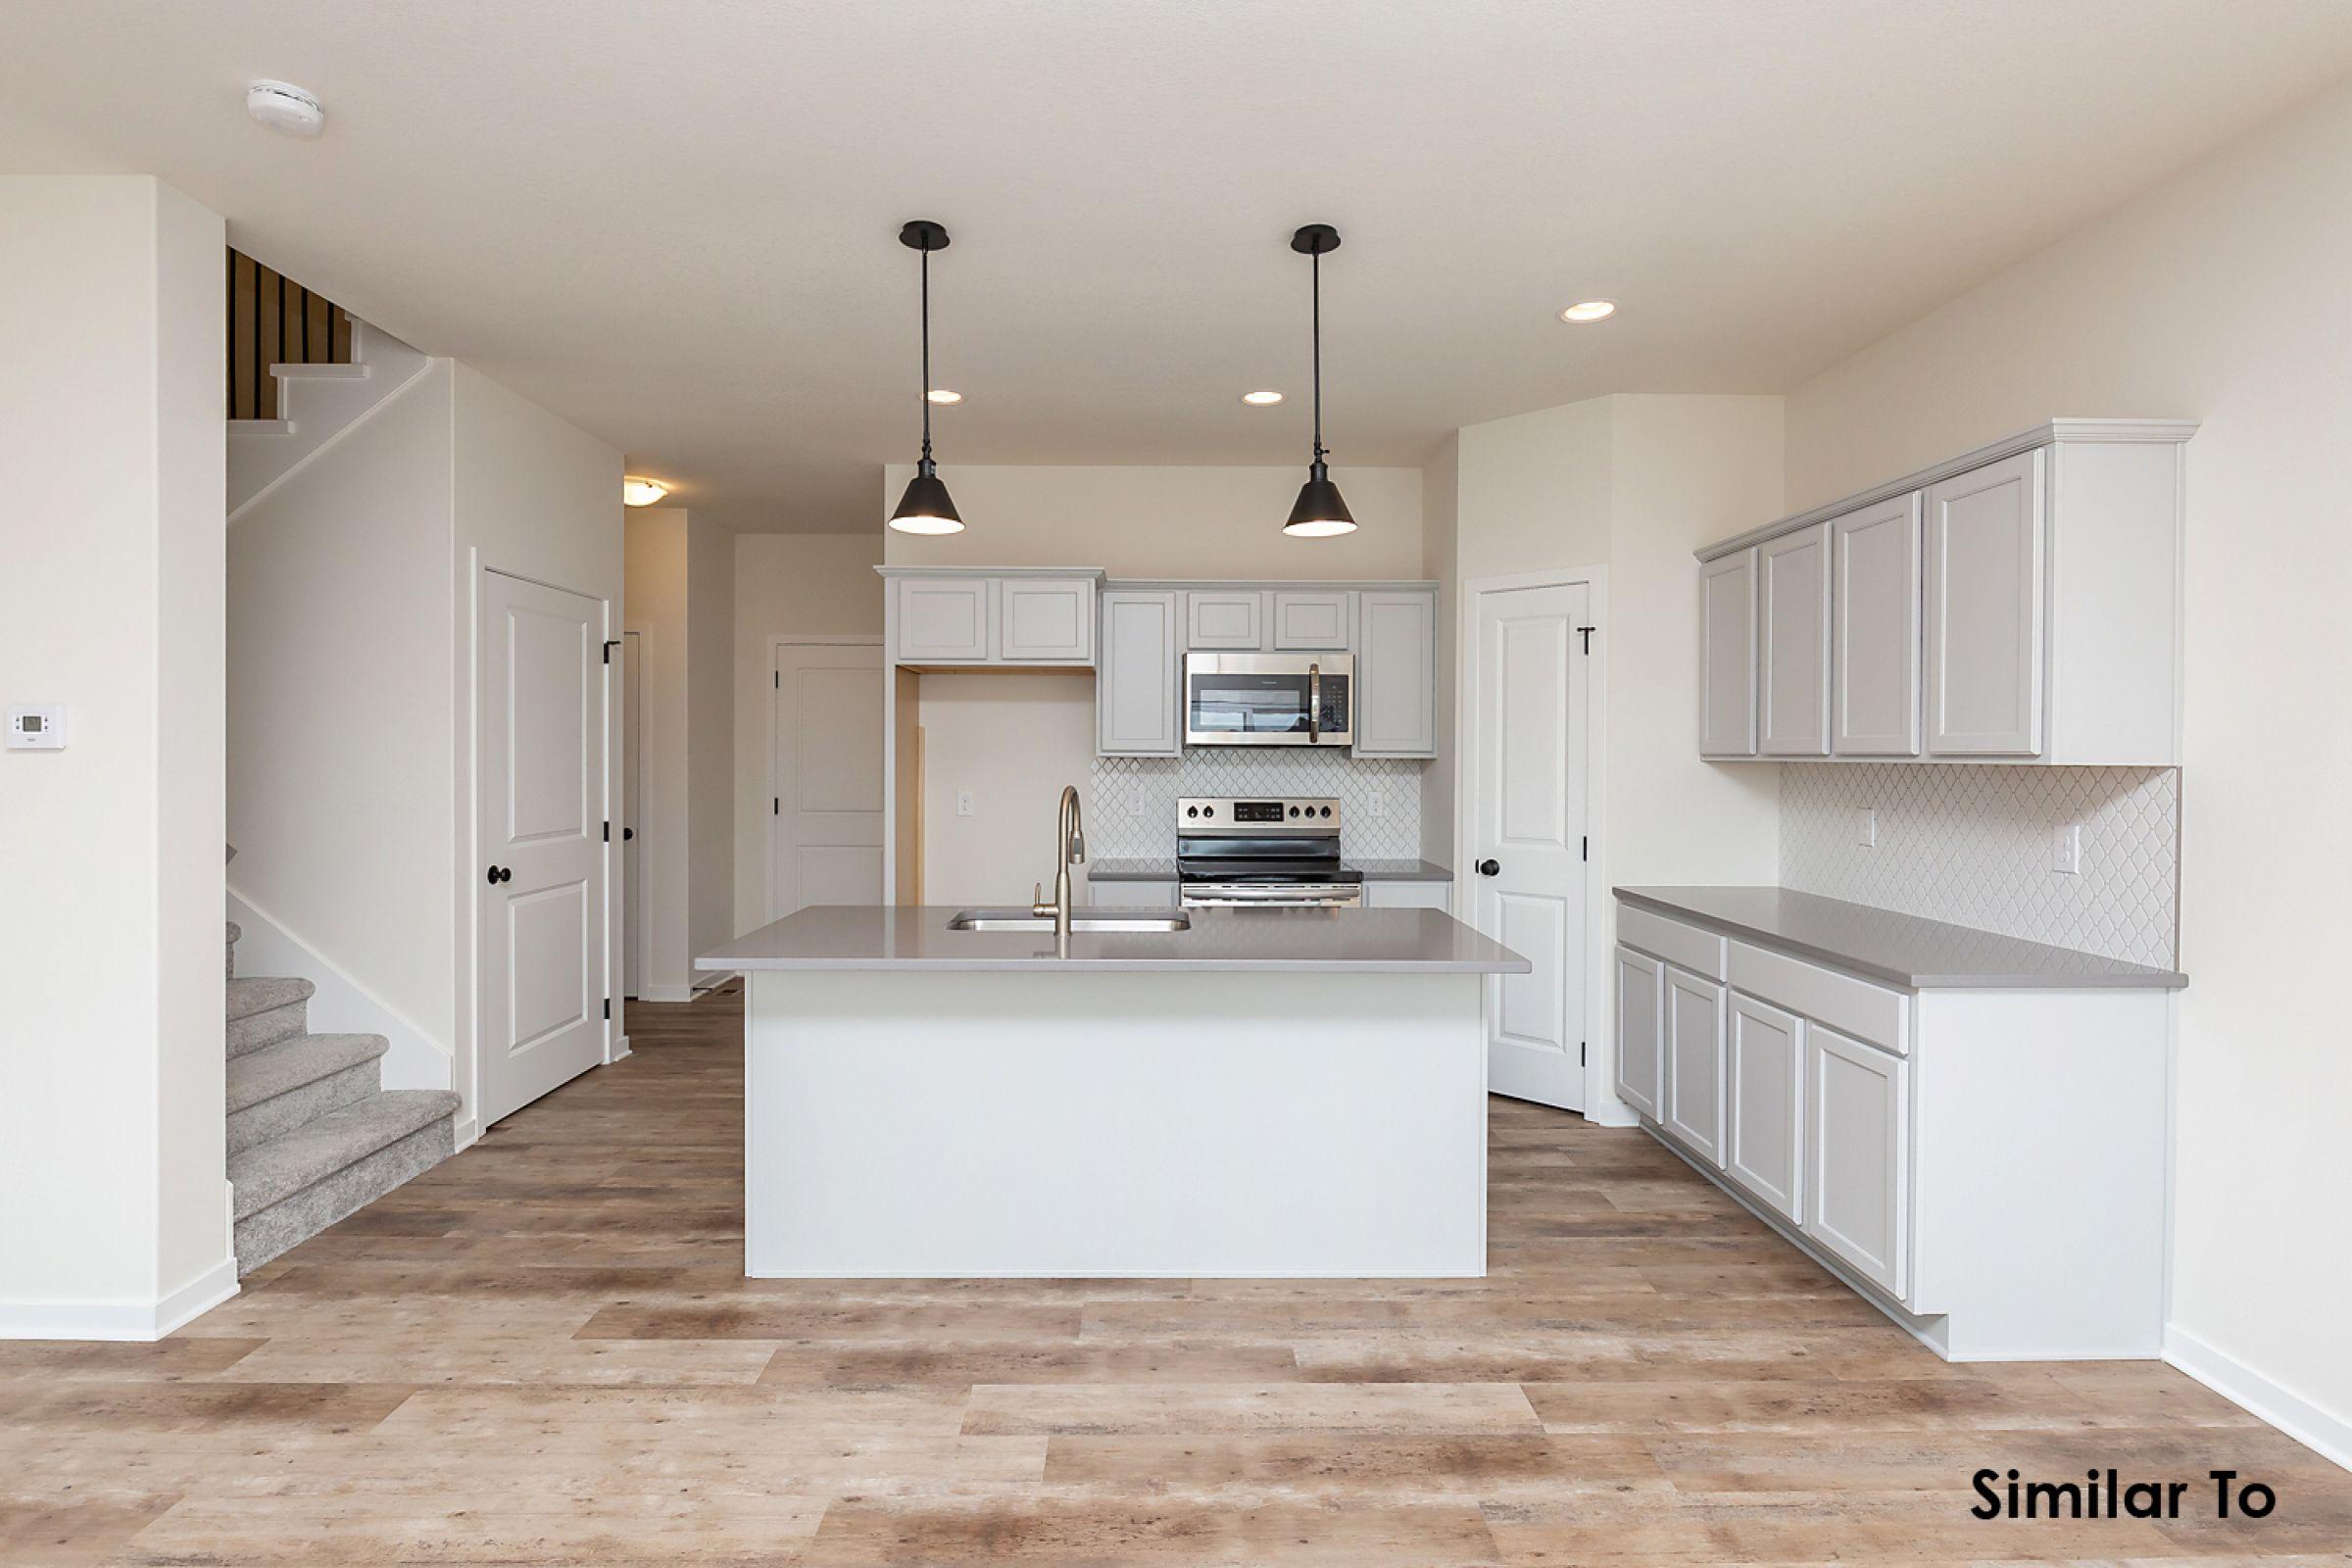 residential-warren-county-iowa-0-acres-listing-number-15134-3-2020-08-27-185018.jpg